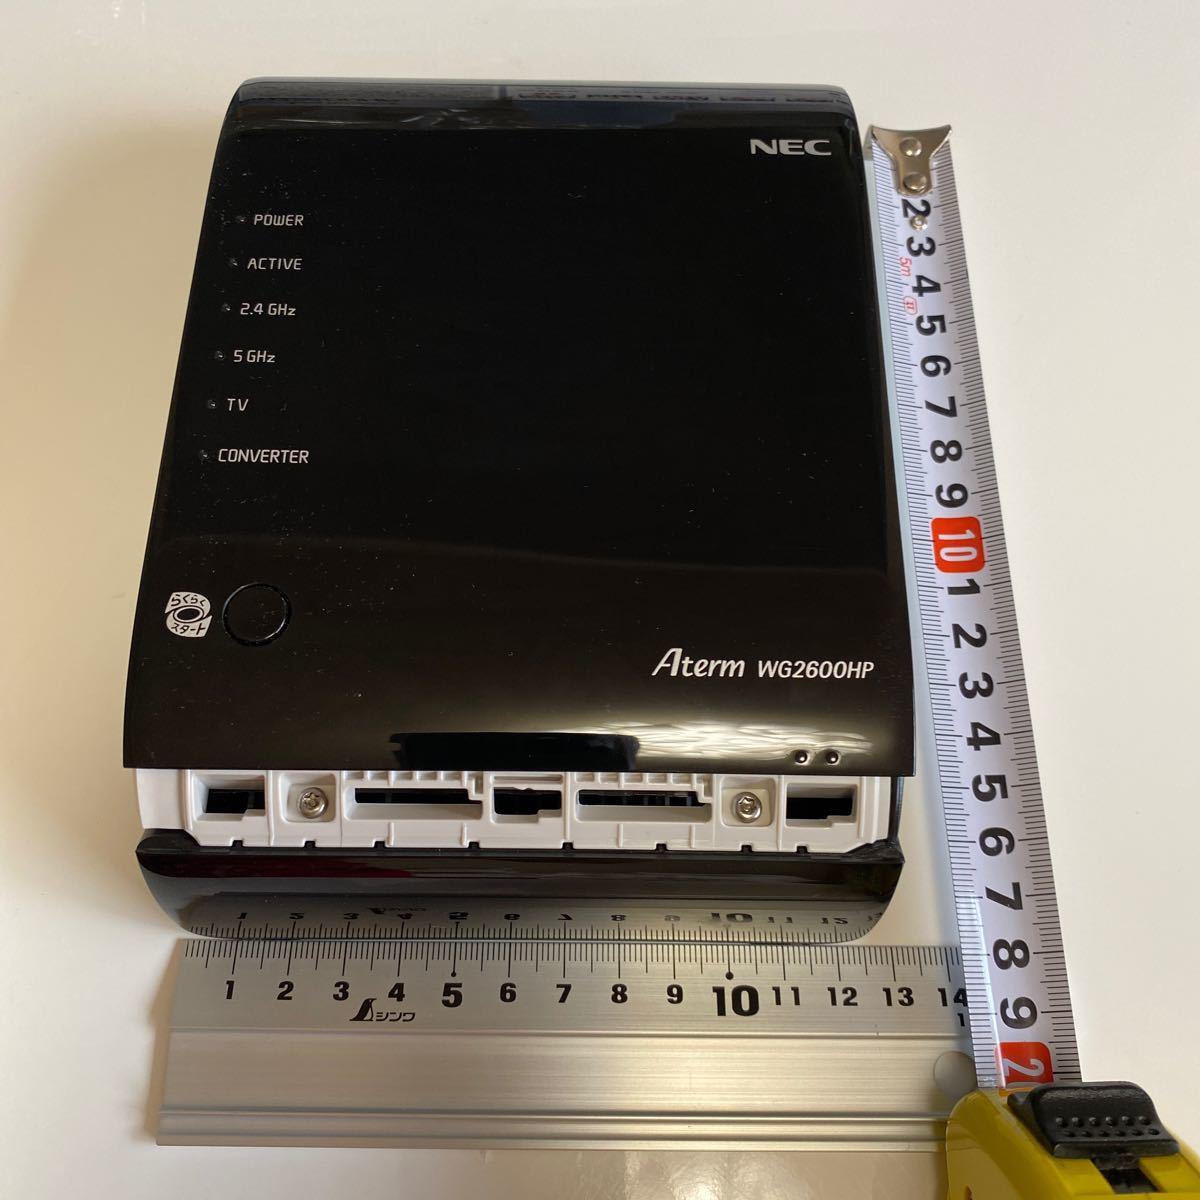 Aterm WG2600HP Wi-Fi NEC 無線LANルータ